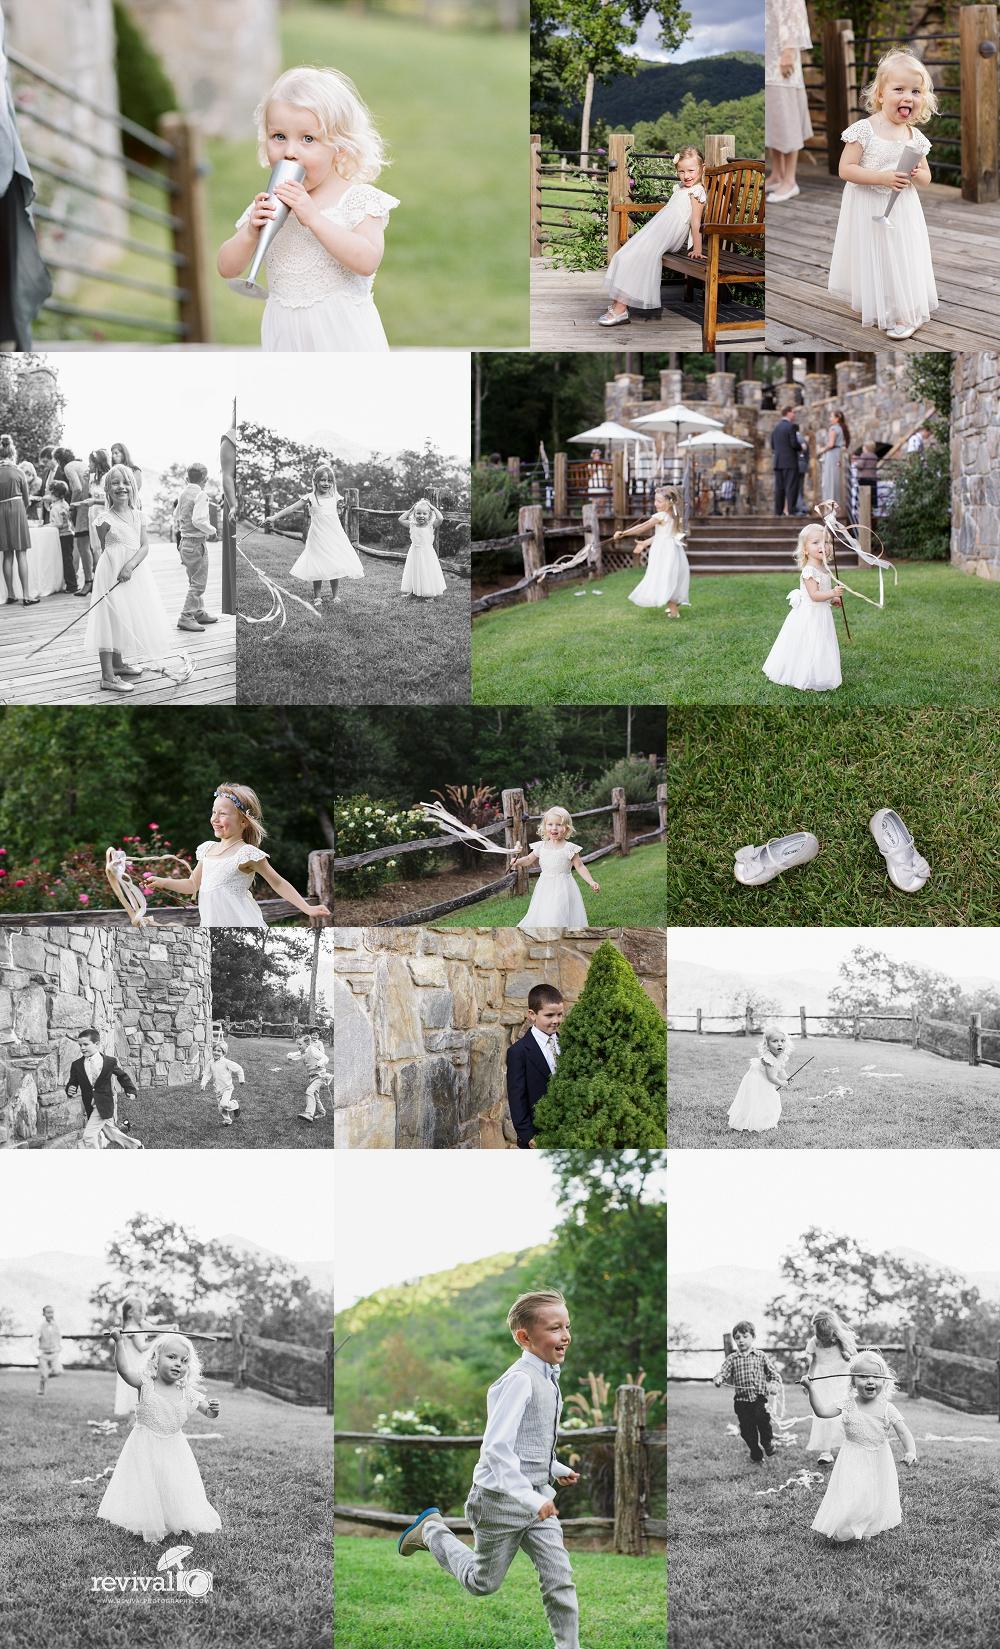 Photos by Revival Photography Fairytale Castle Wedding at Castle Ladyhawke NC Wedding Photographers www.revivalphotography.com